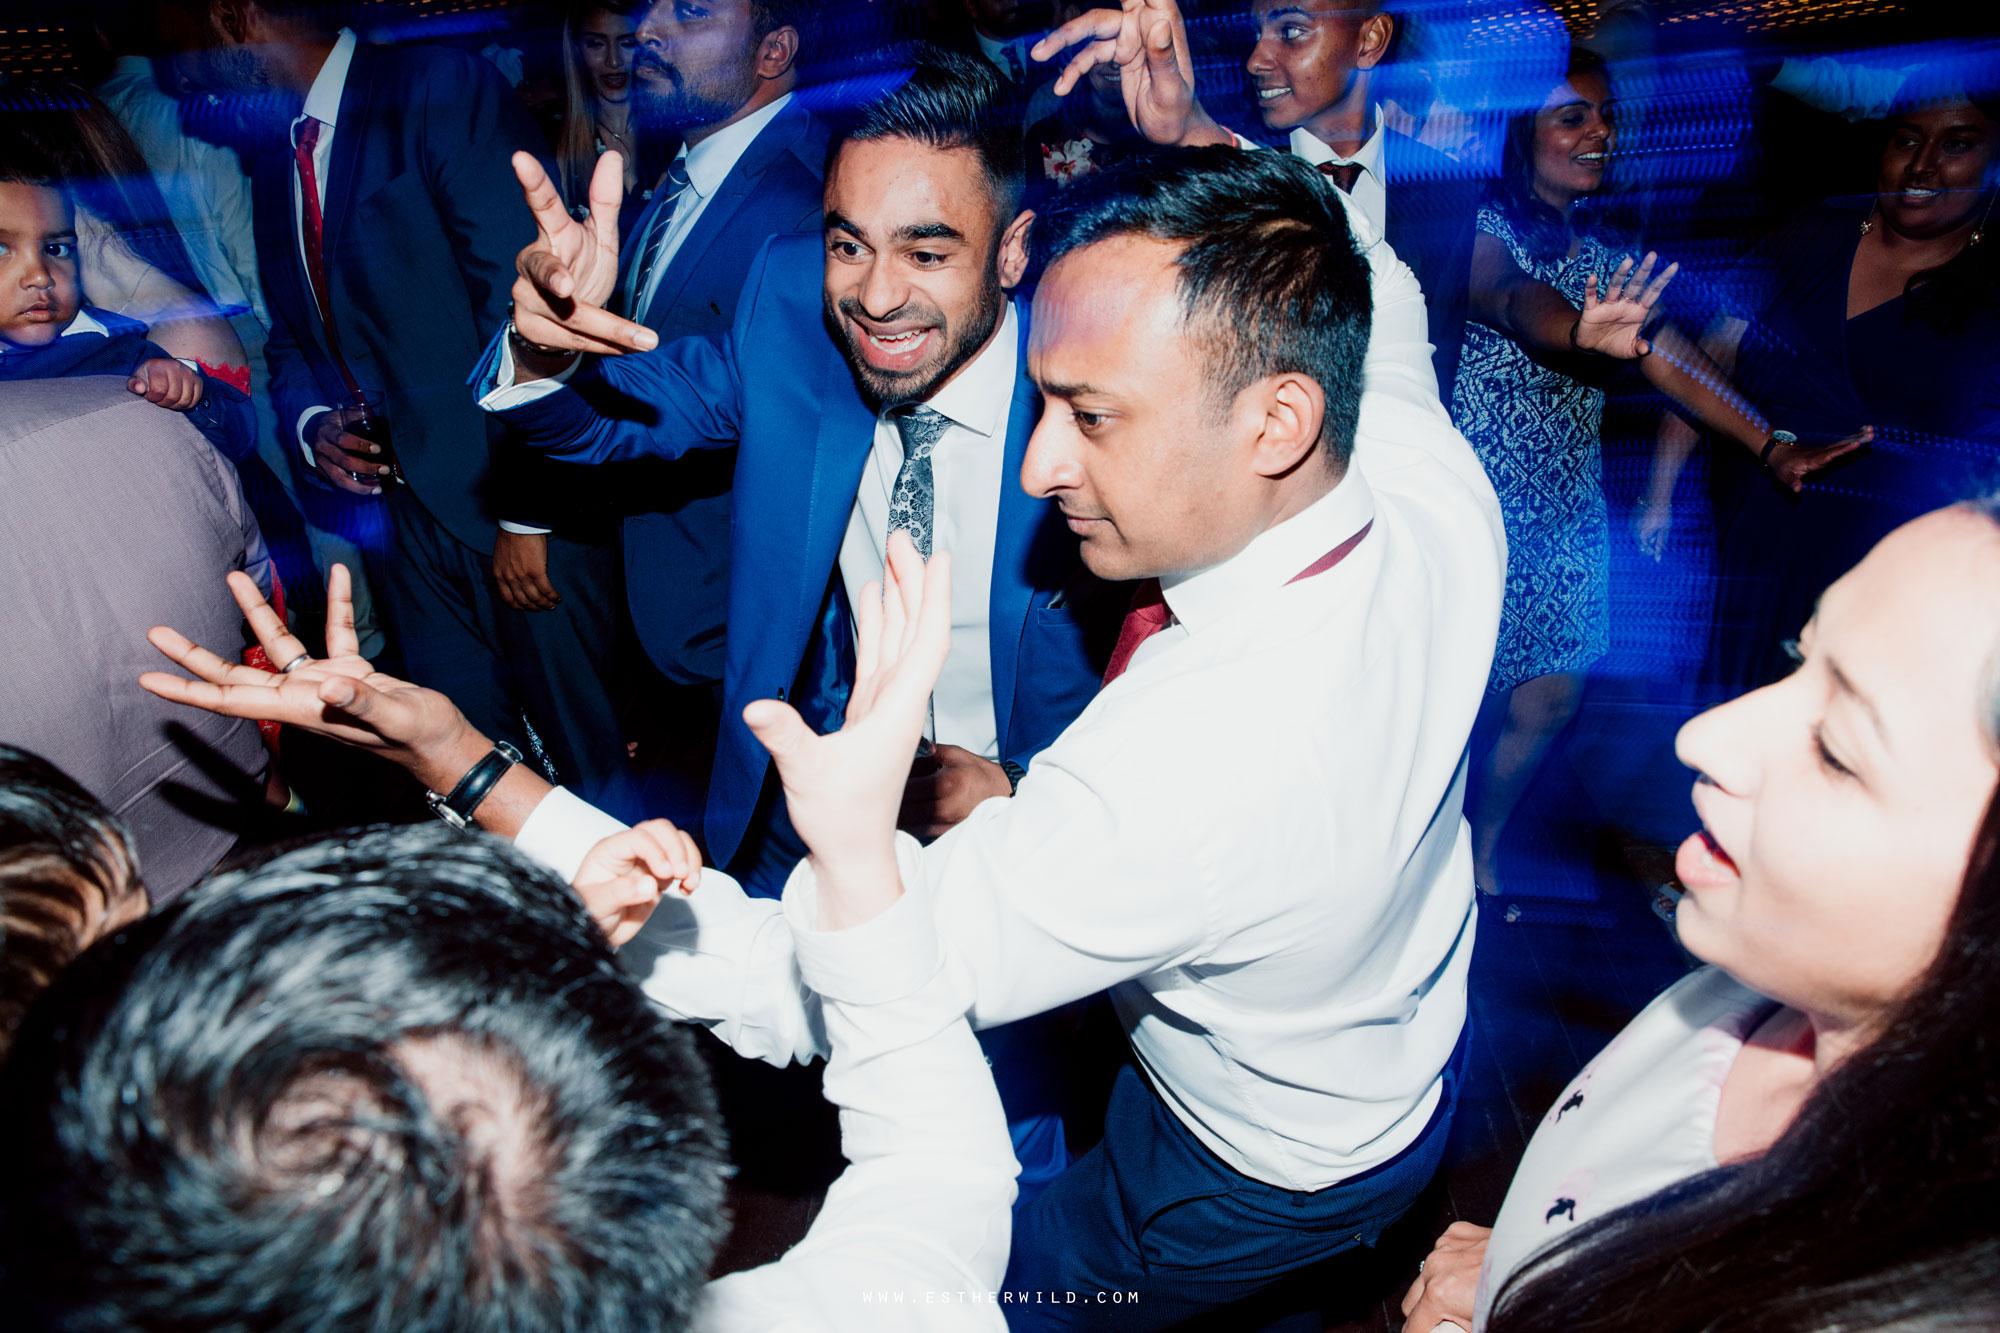 Northbrook_Park_Farnham_Surrey_London_Wedding_Hindu_Fusion_Esther_Wild_Photographer_IMG_6945.jpg